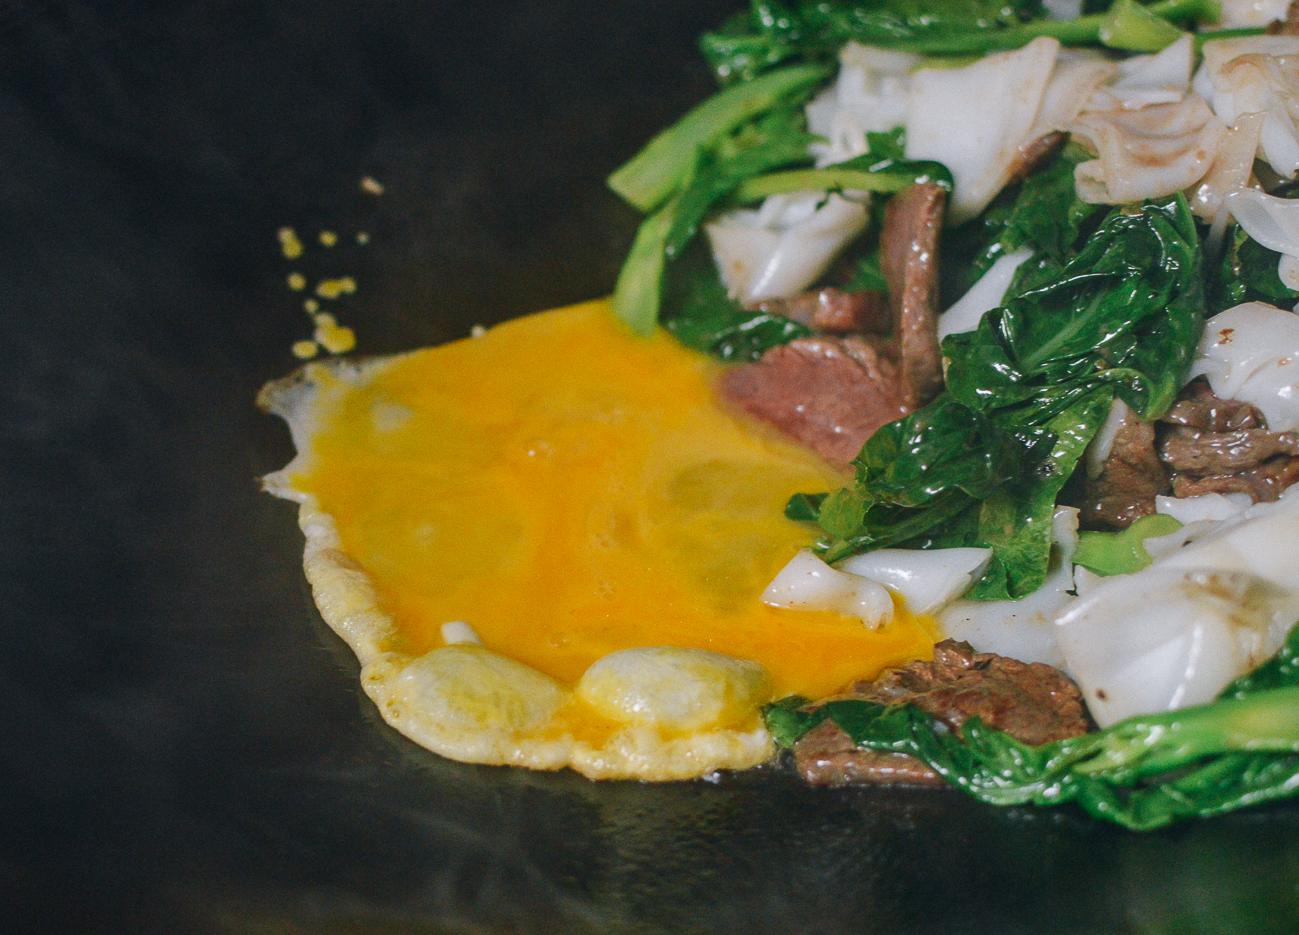 Scrambling egg in wok for pad see ew